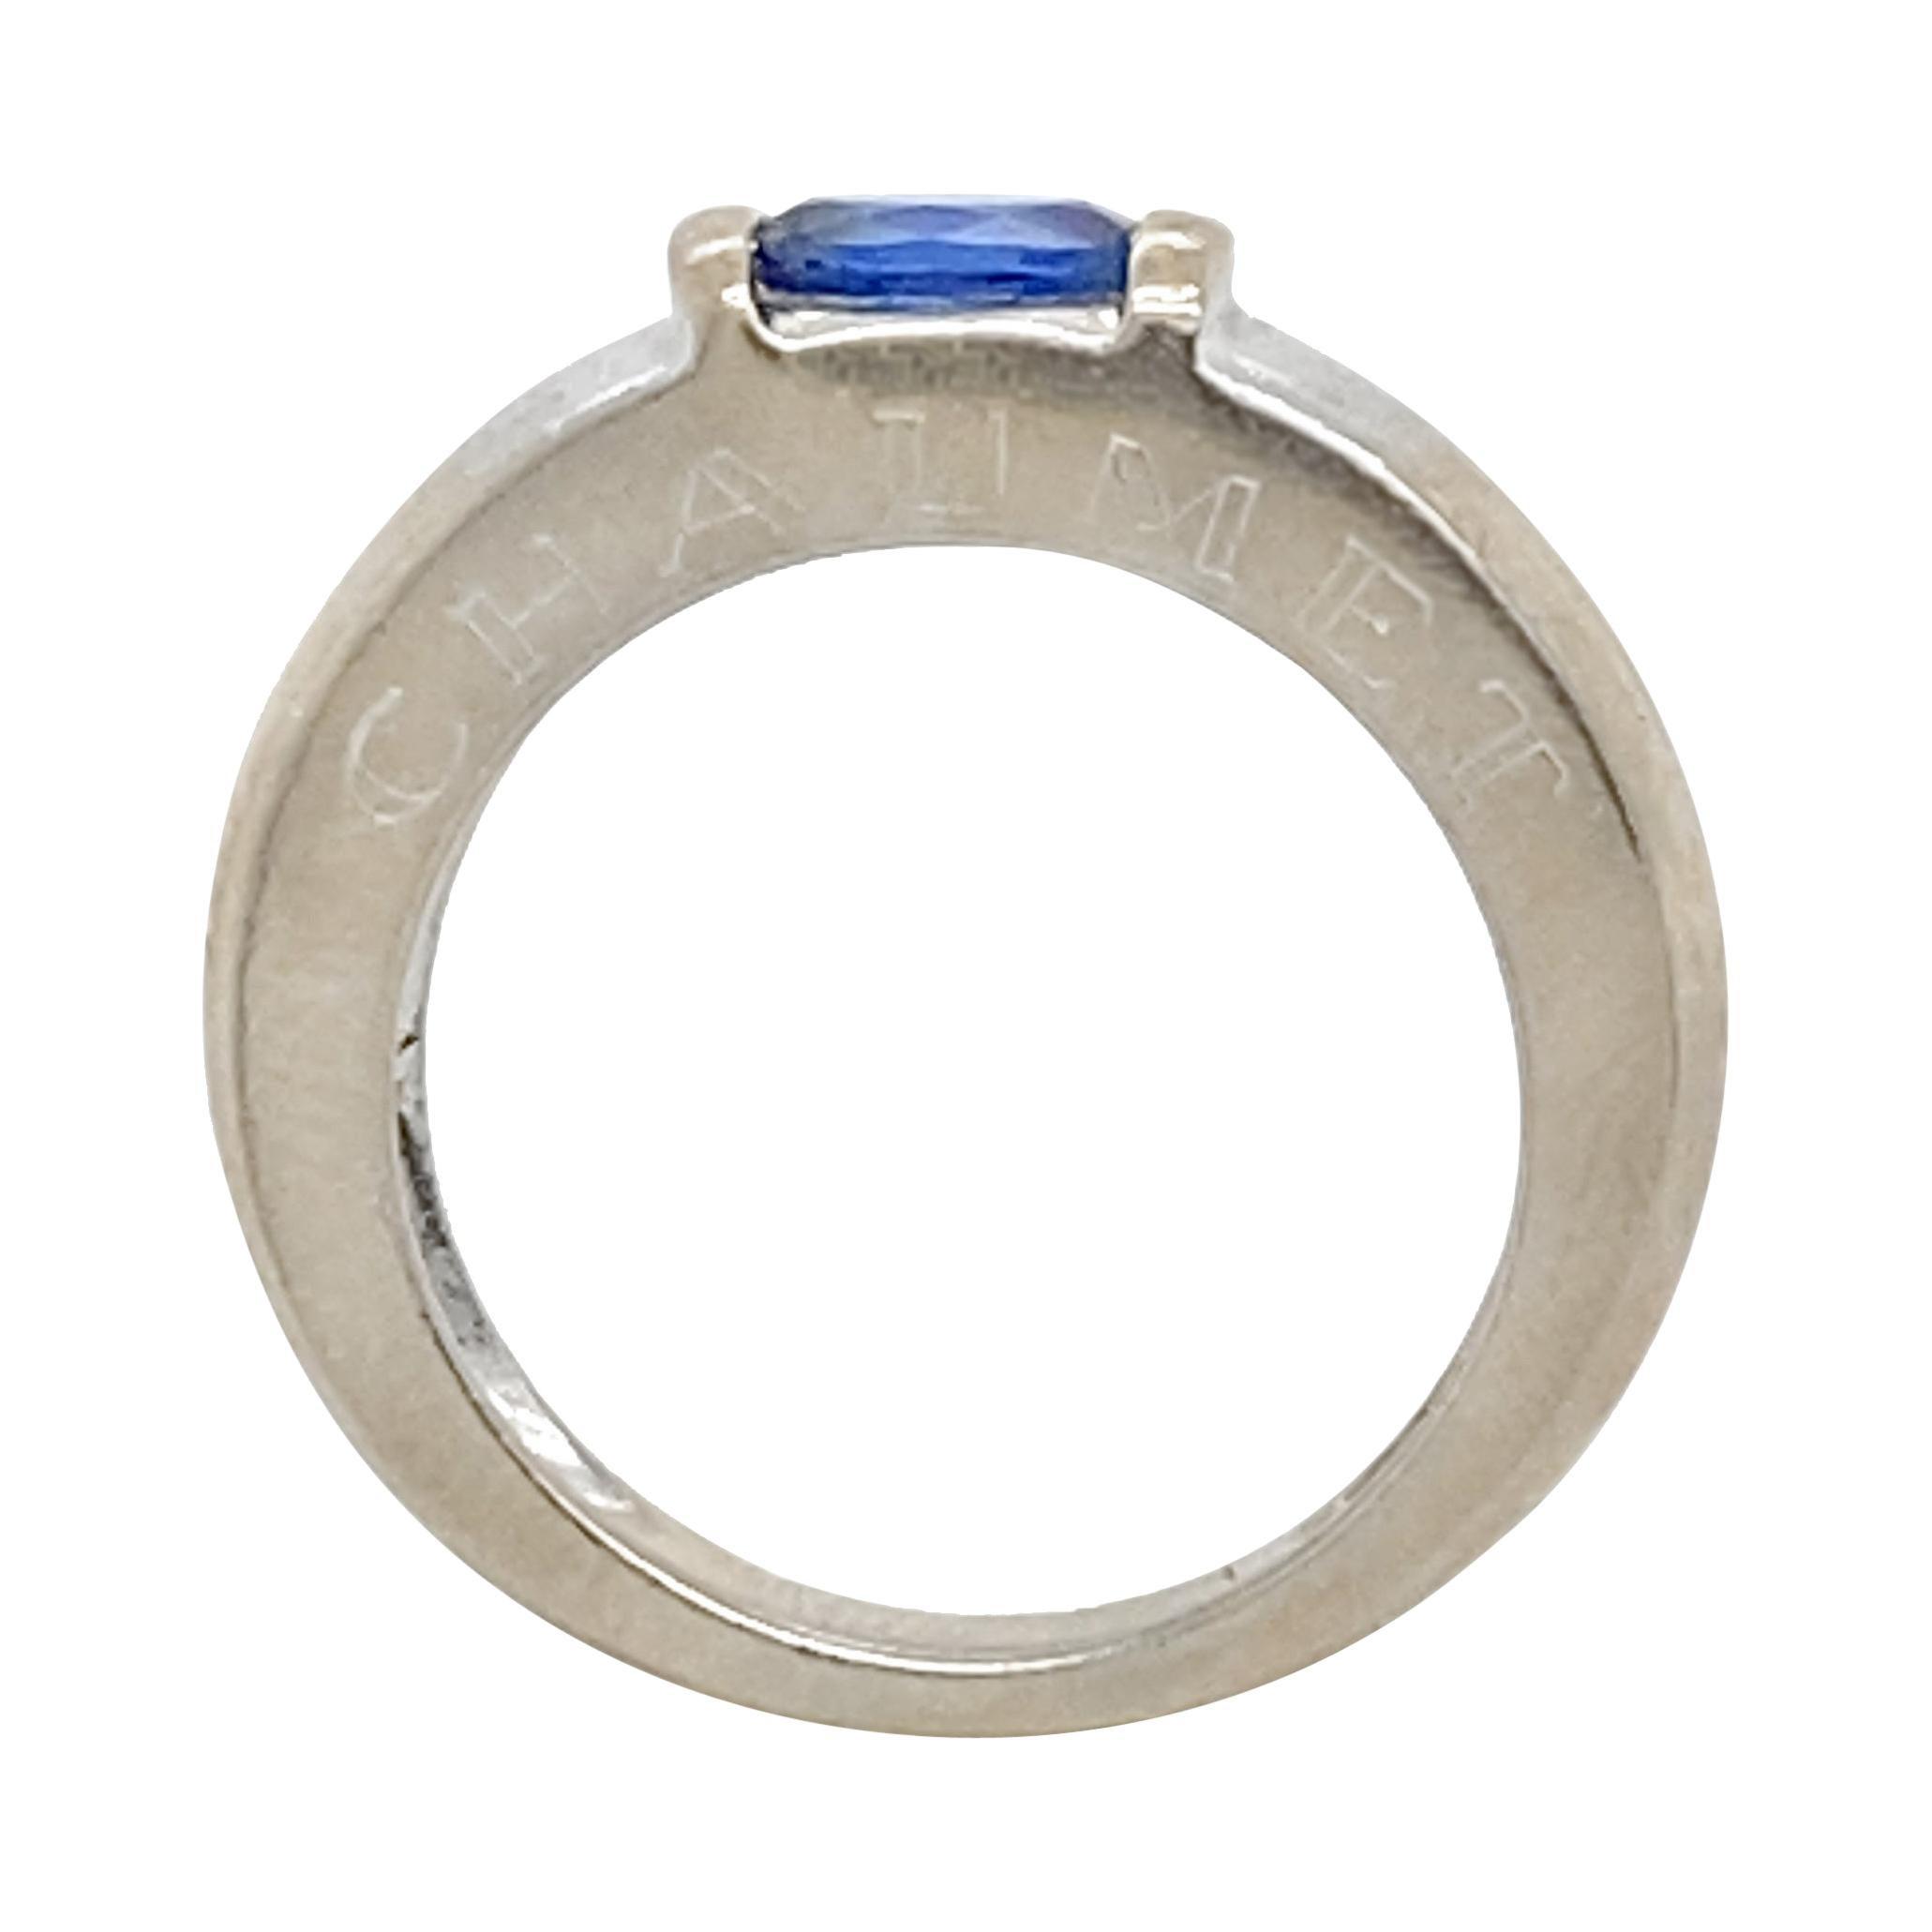 Chaumet Sapphire Ring